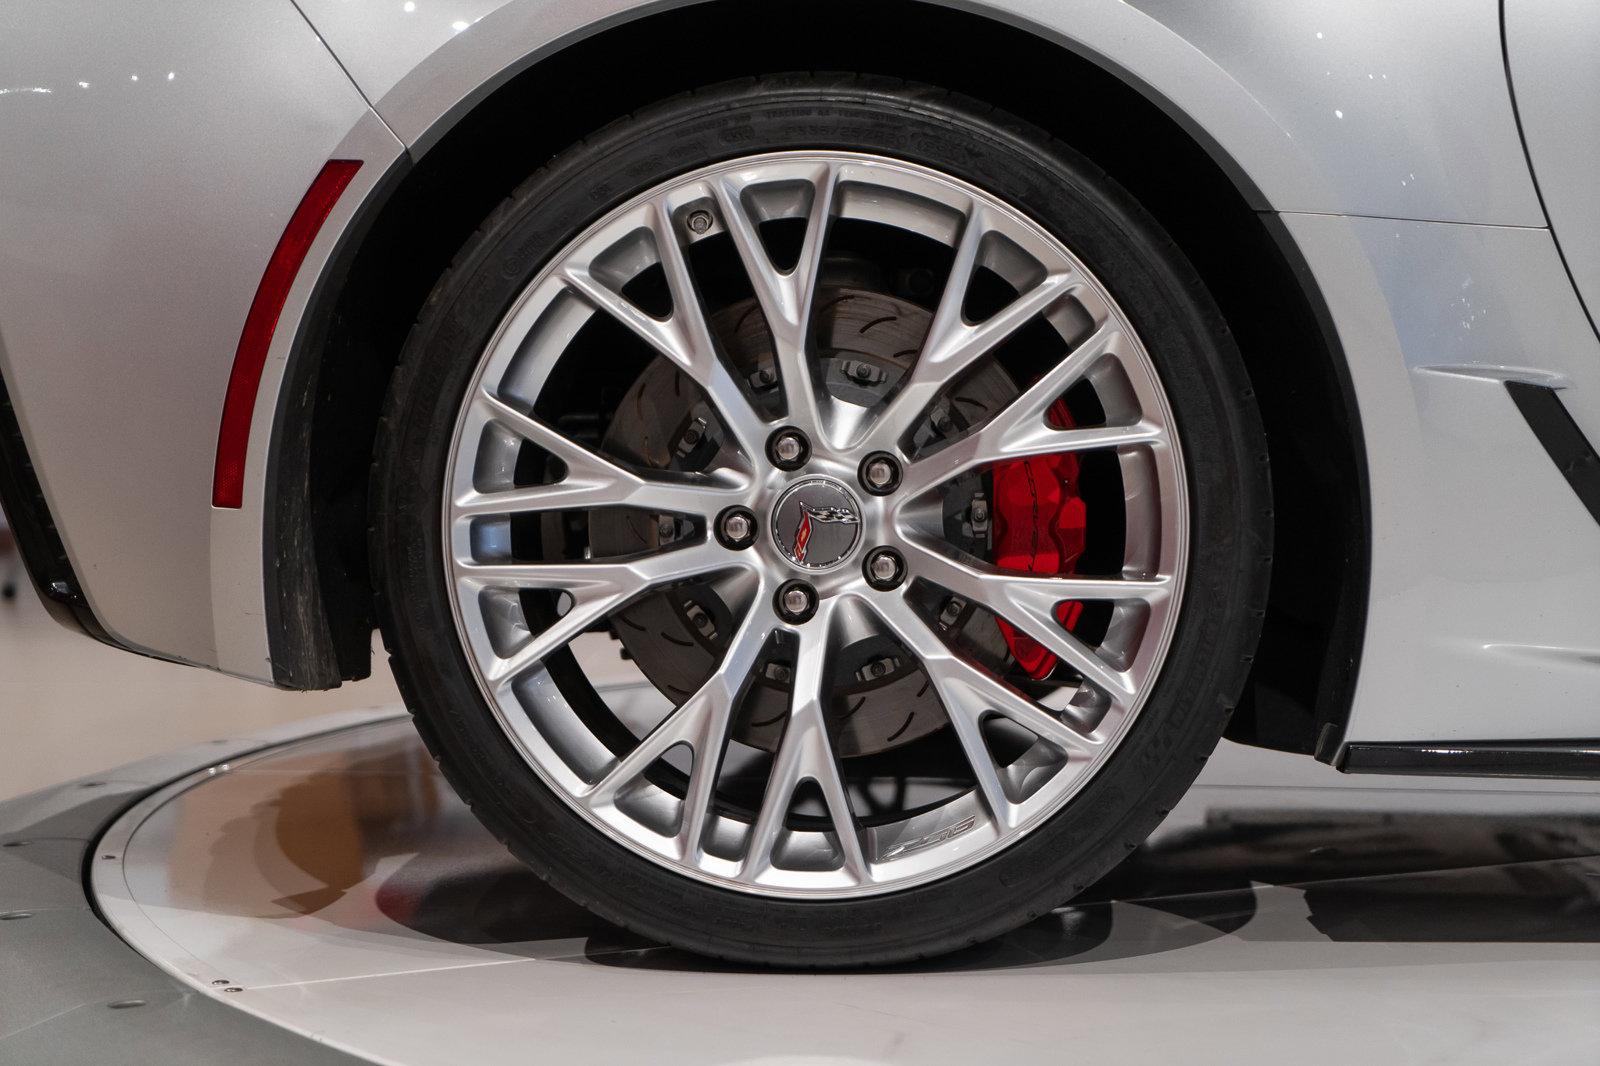 Pre-Owned 2015 Chevrolet Corvette Z06 3LZ